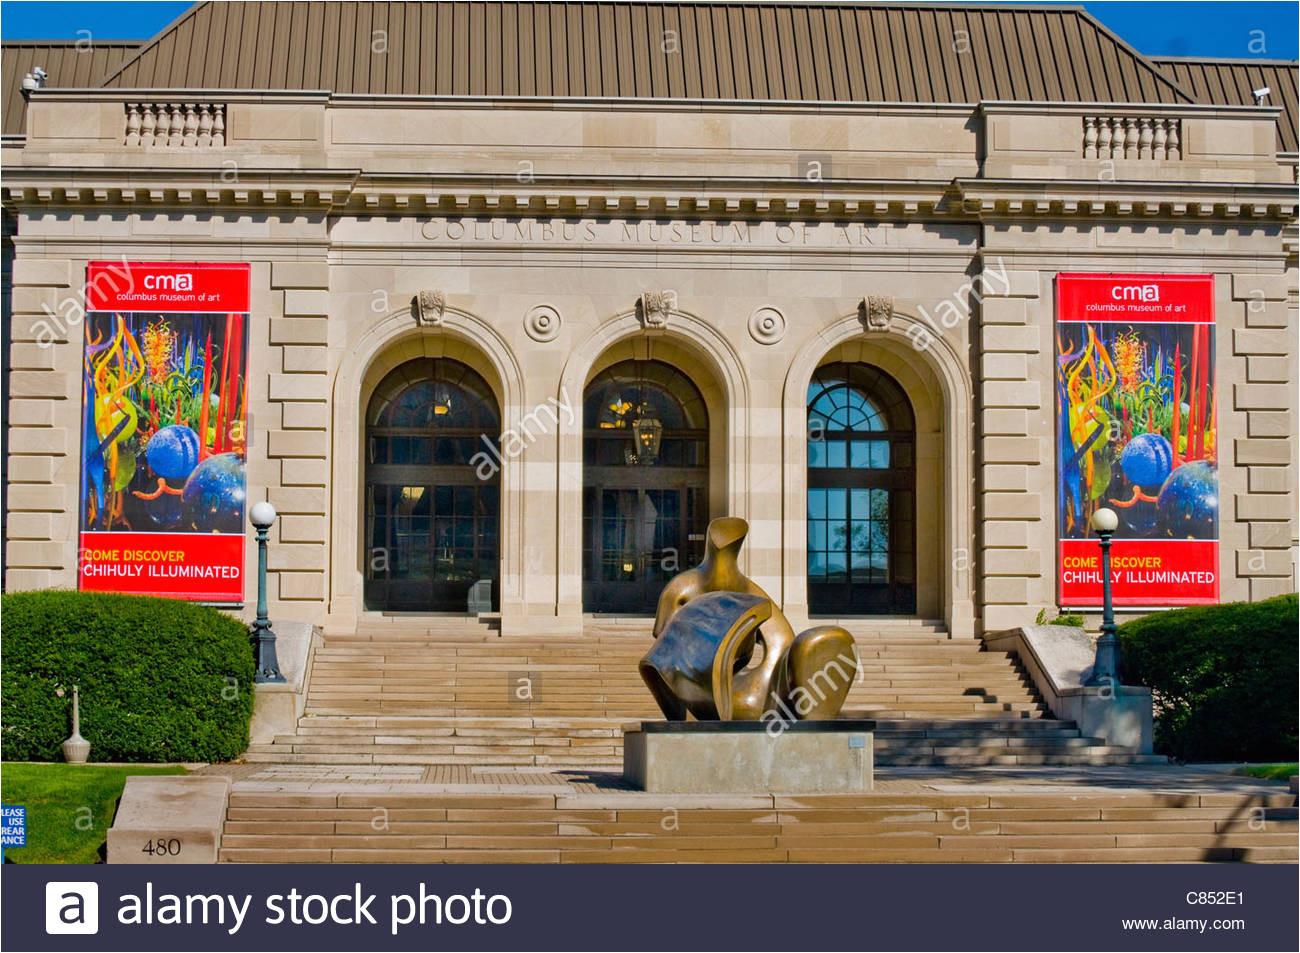 columbus museum of art in columbus ohio mit der liegenden figur skulptur von henry moore